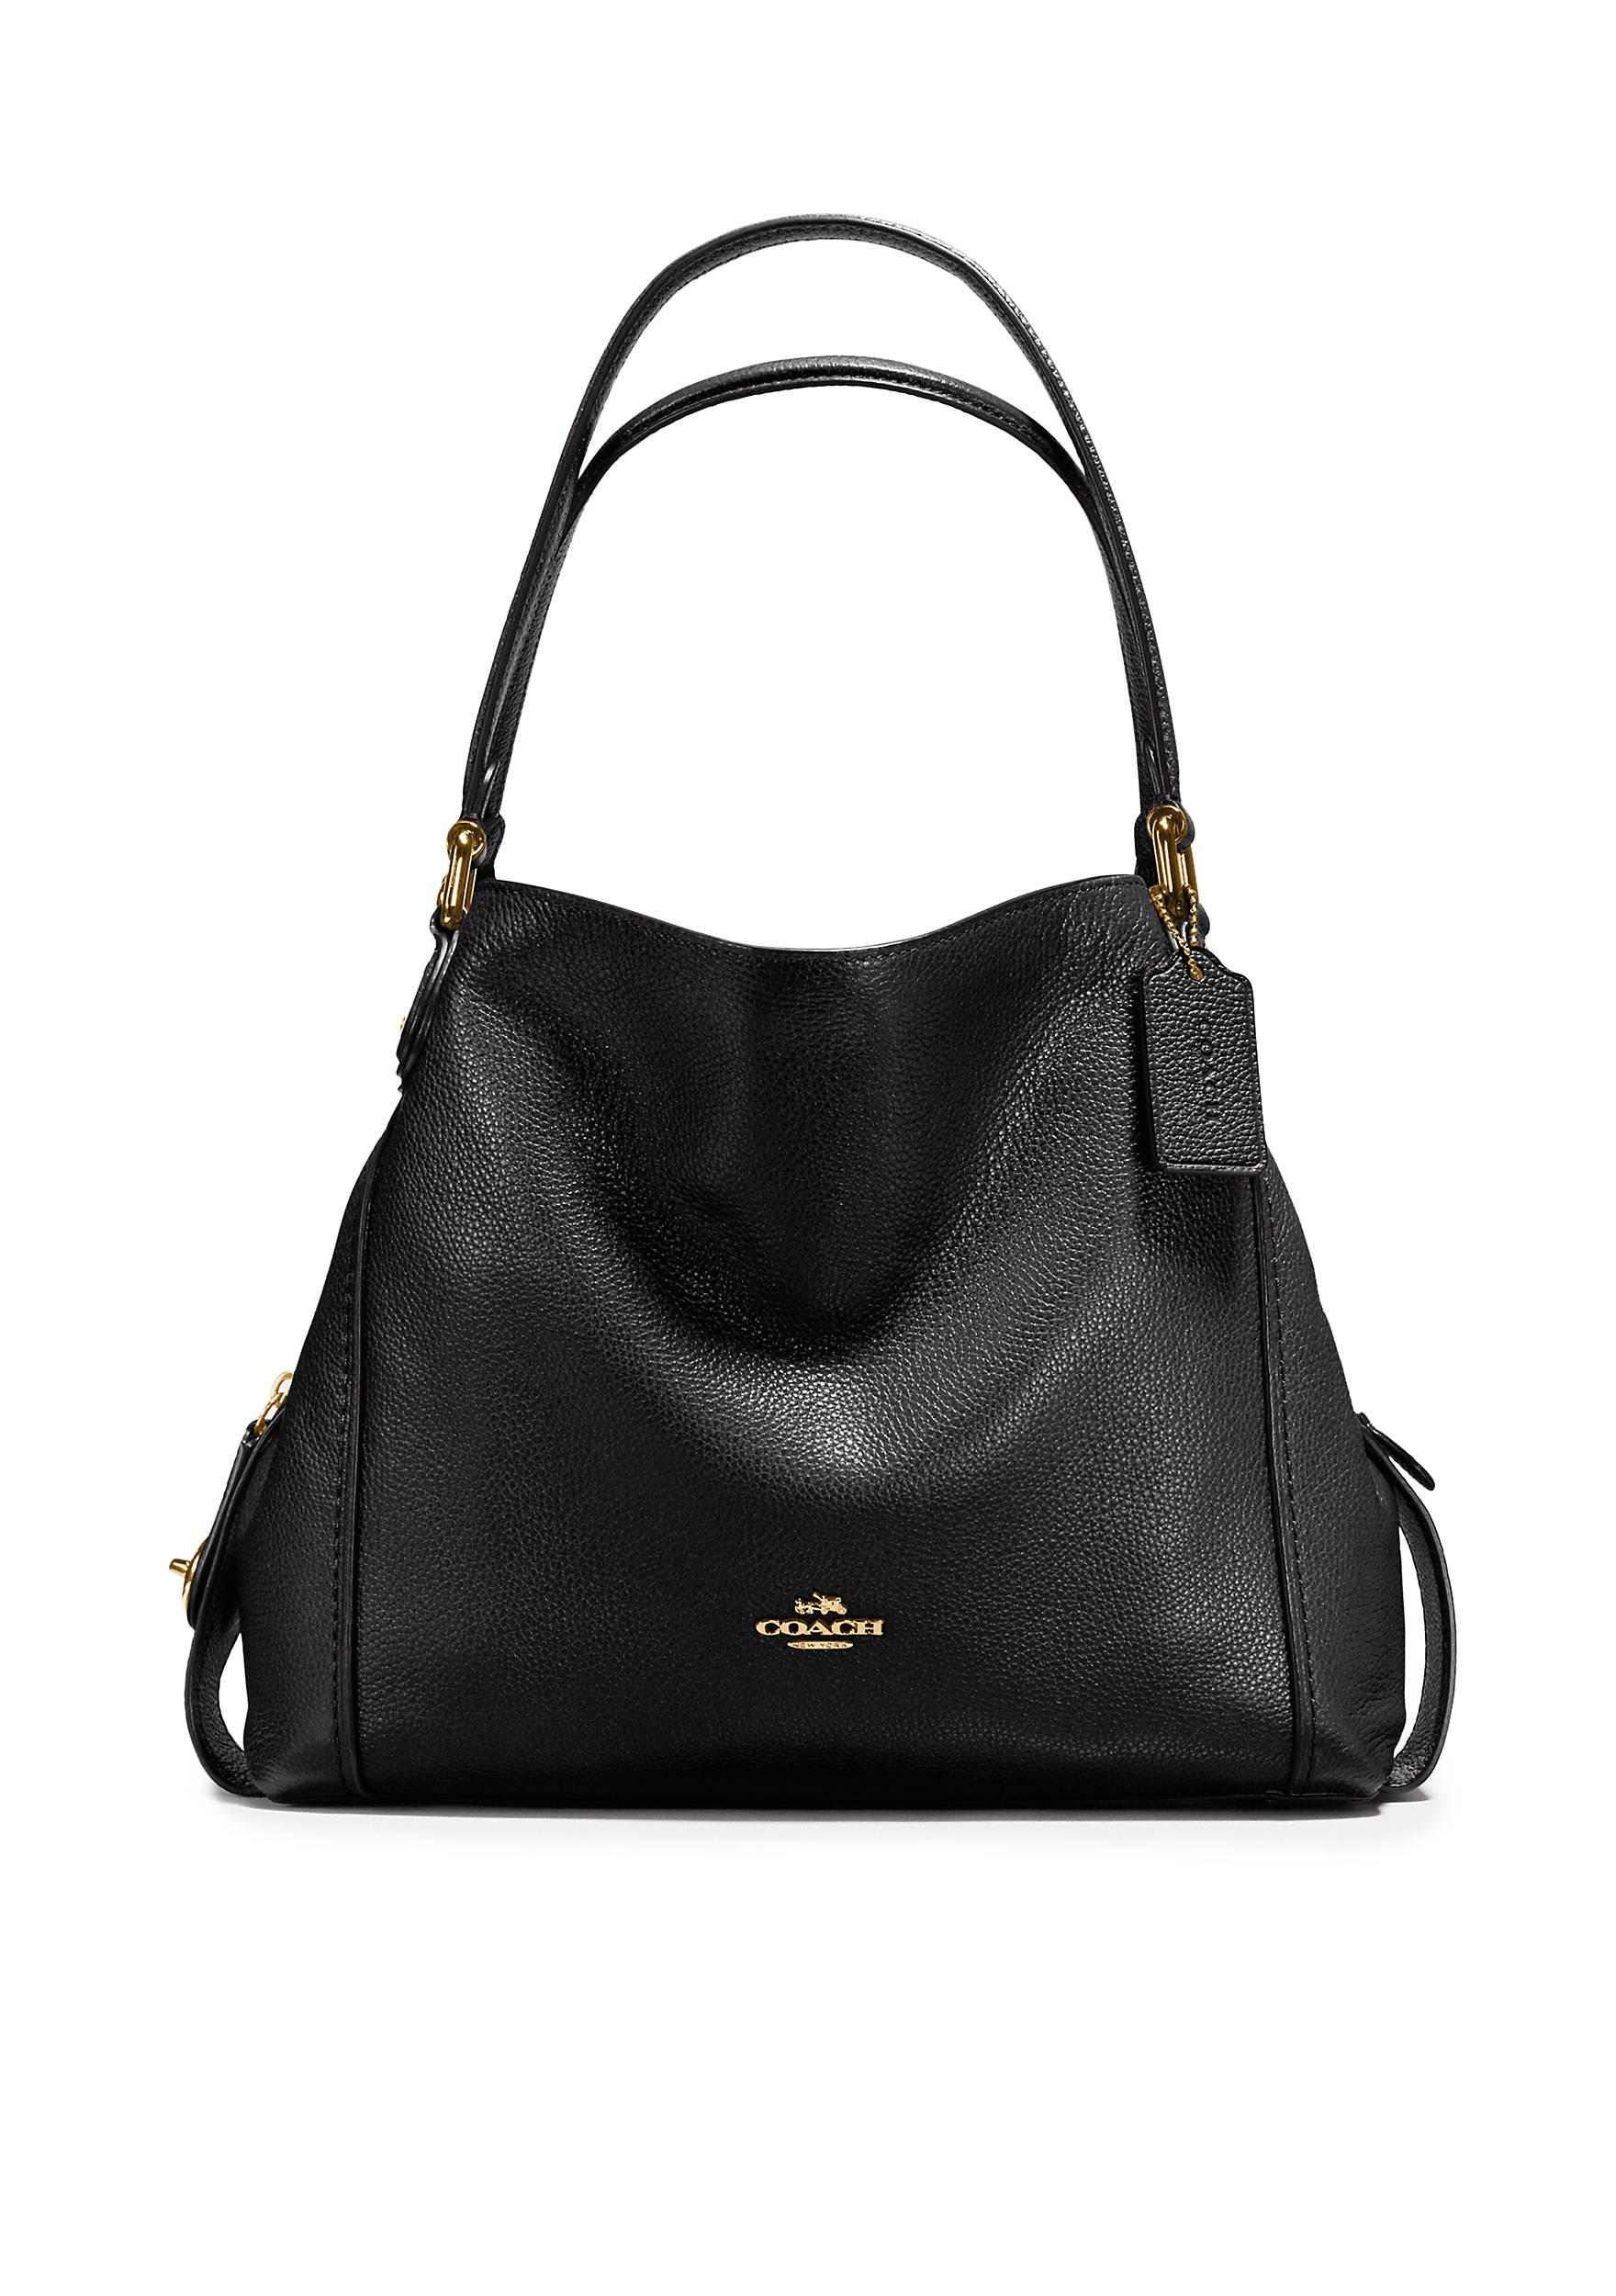 COACH Edie Shoulder Bag 31 In Polished Pebble Leather | belk